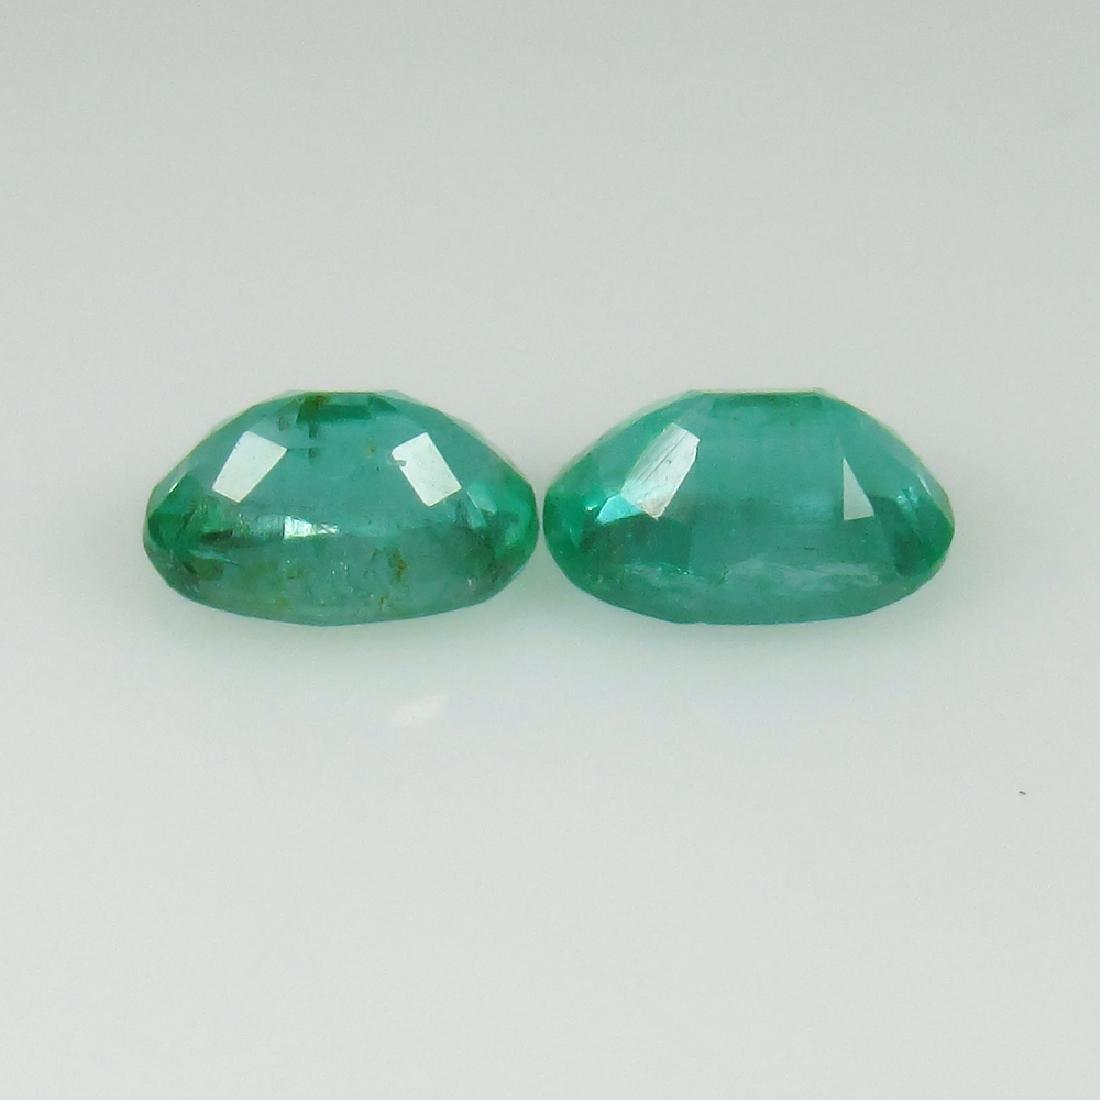 0.97 Ct Genuine Zambian Emerald Matching Oval Pair - 2